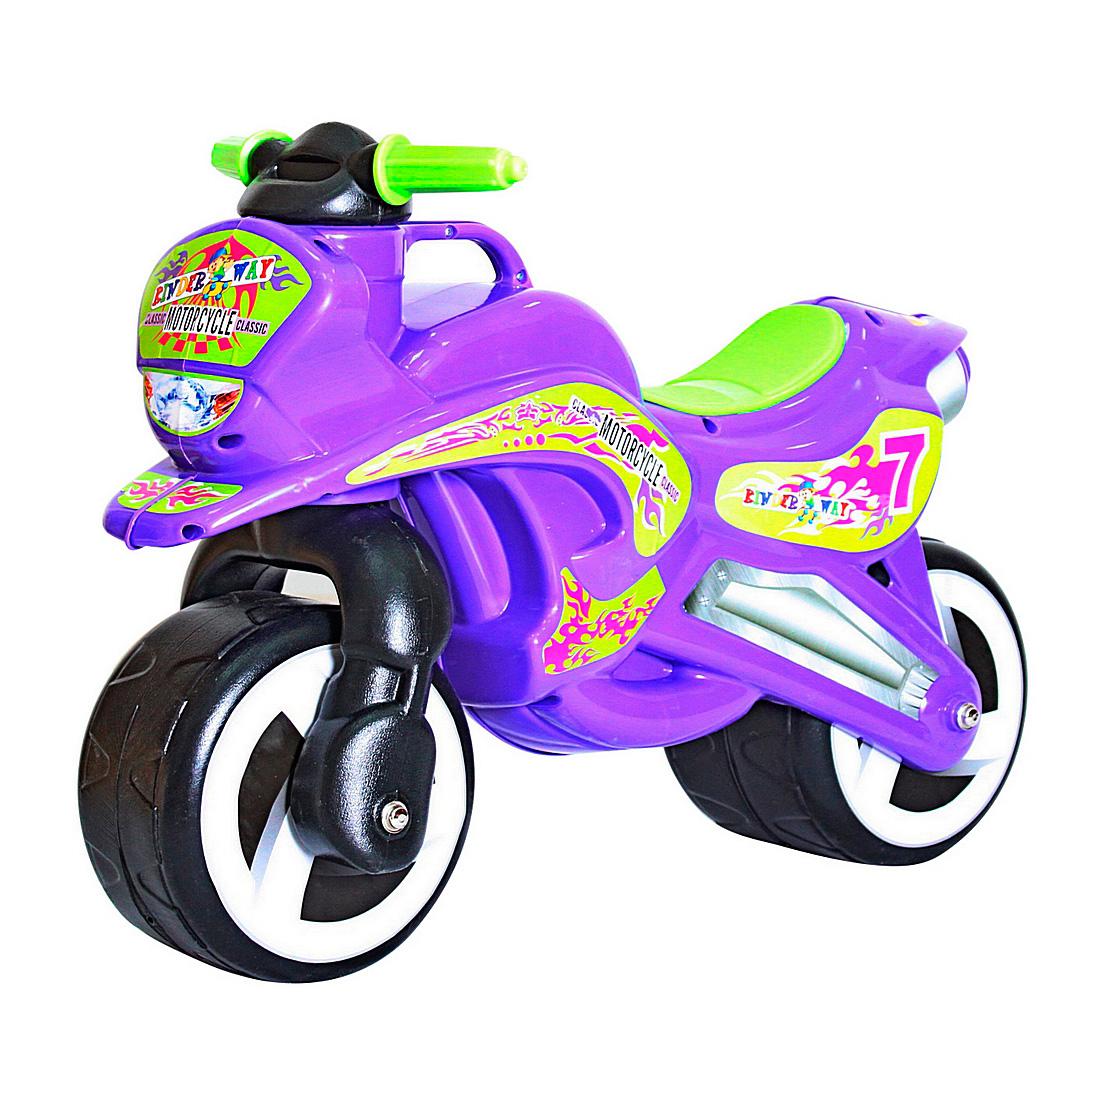 Беговел RT 11-006 MotorCycle 7 Фиолетовый<br>